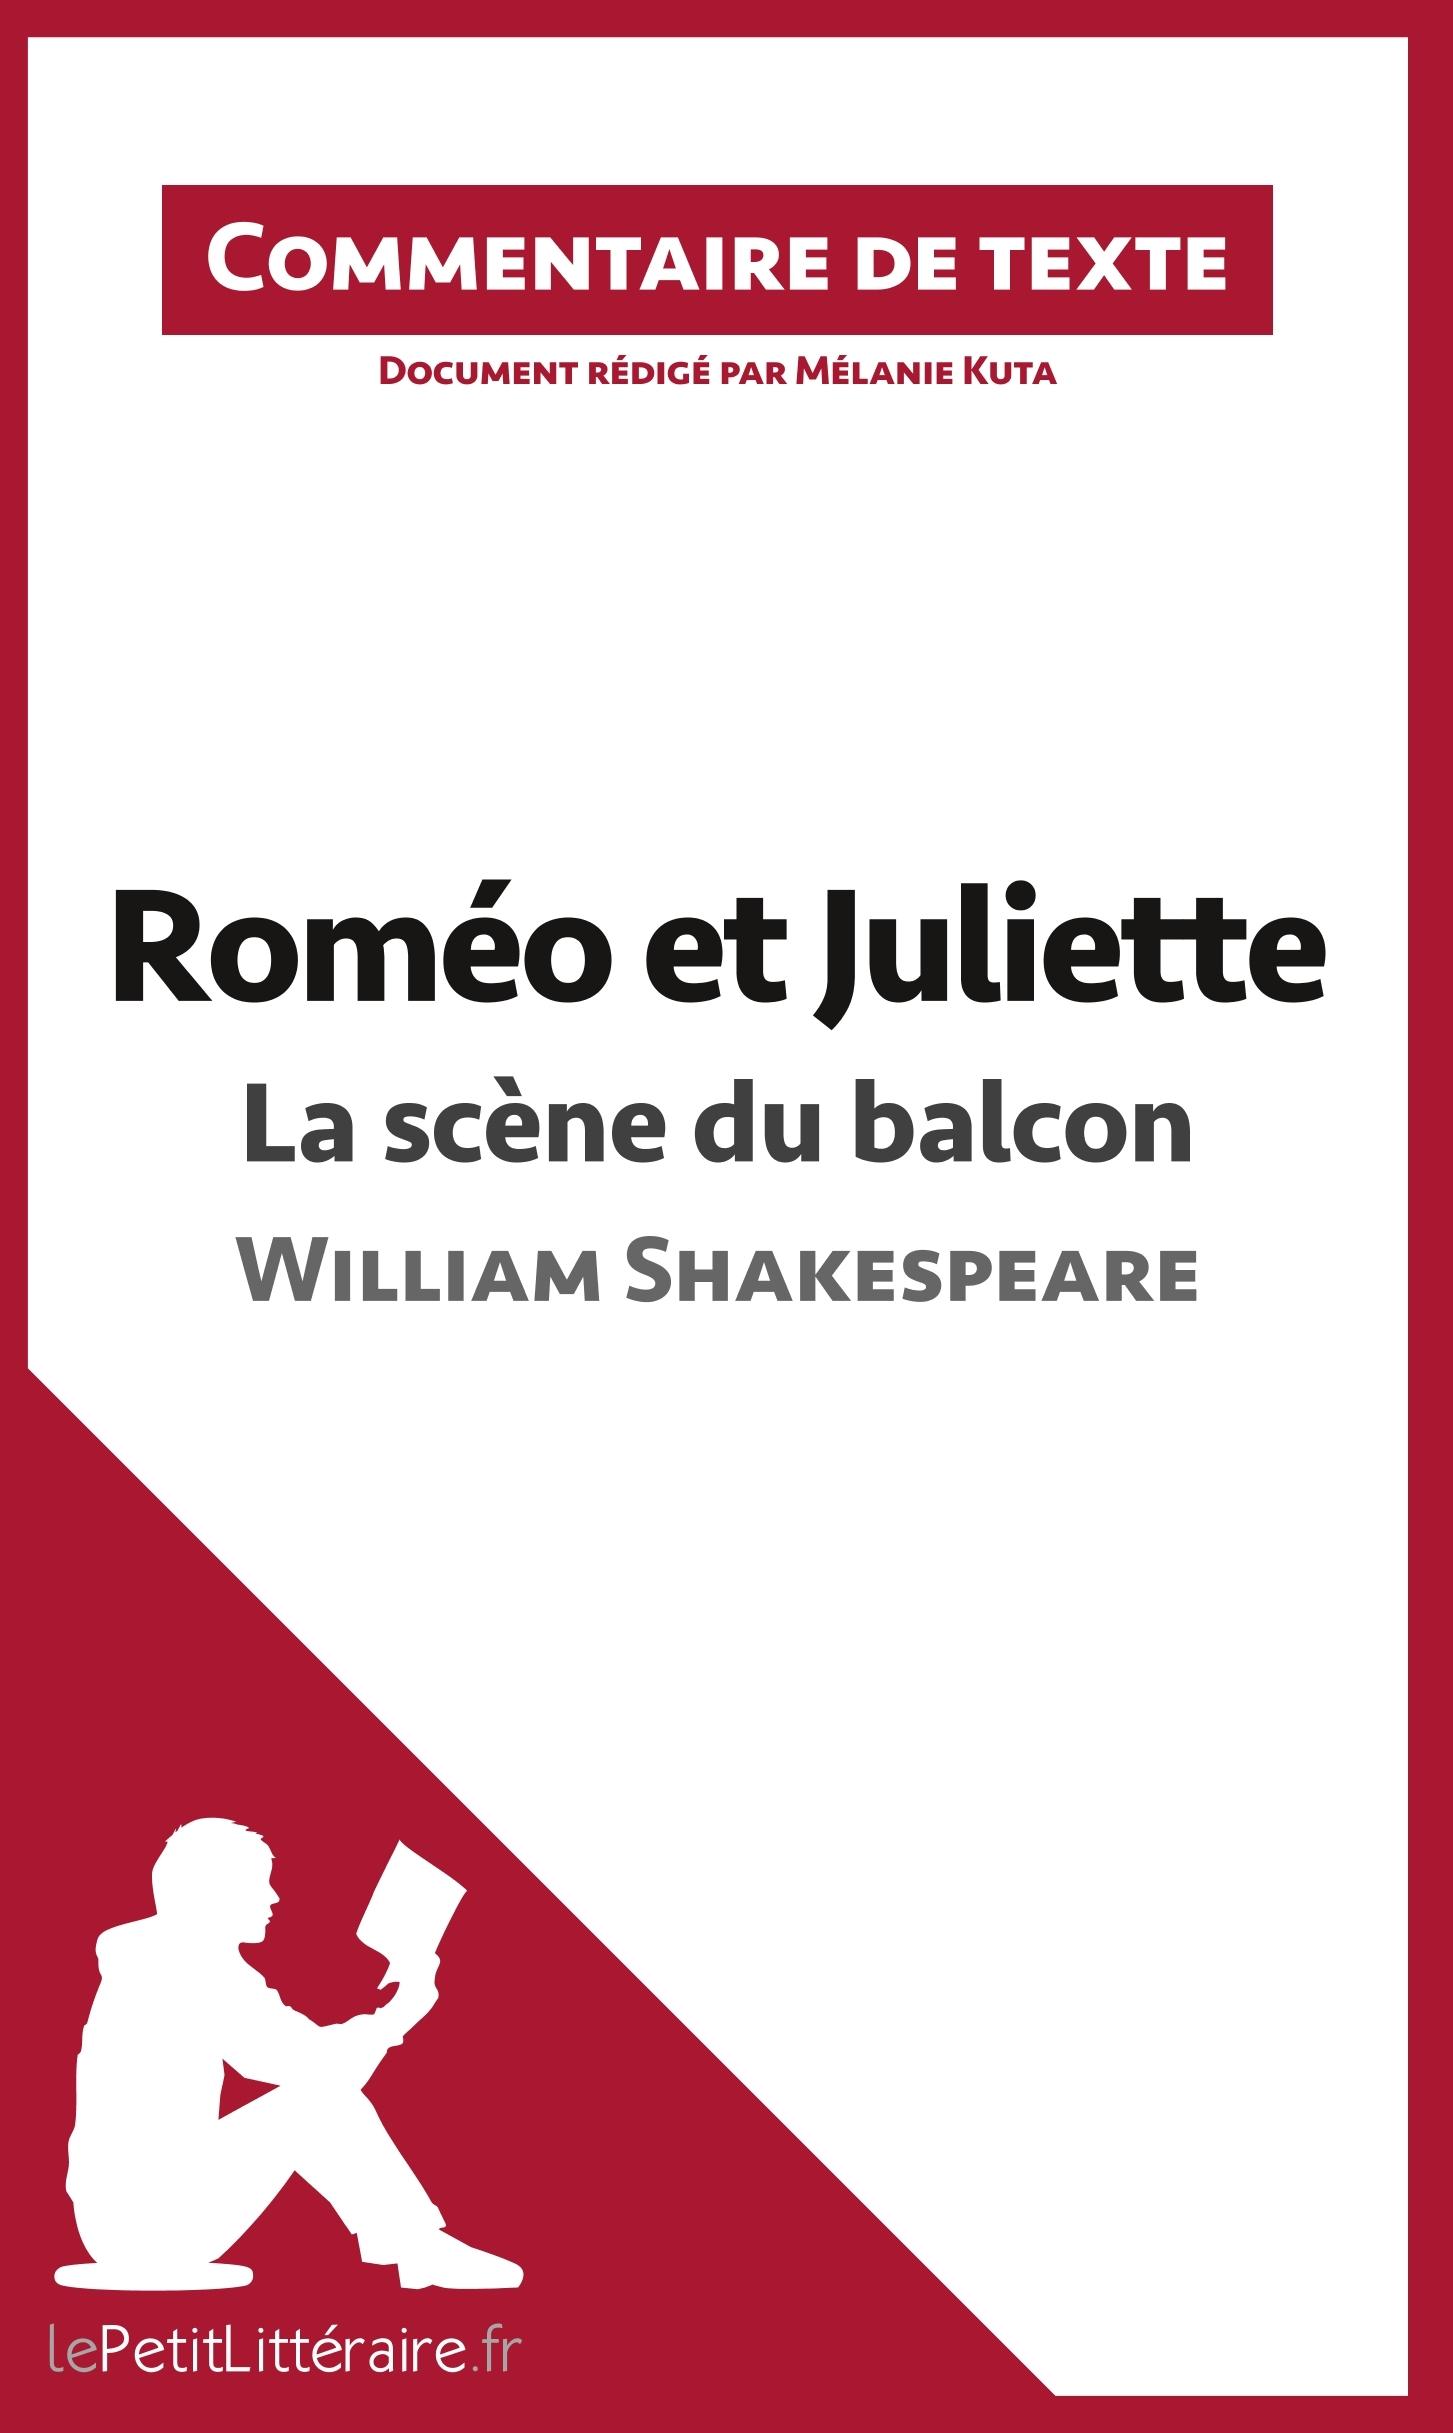 COMMENTAIRE COMPOSE ROMEO ET JULIETTE DE SHAKESPEARE LA SCENE DU BALCON ACTE II